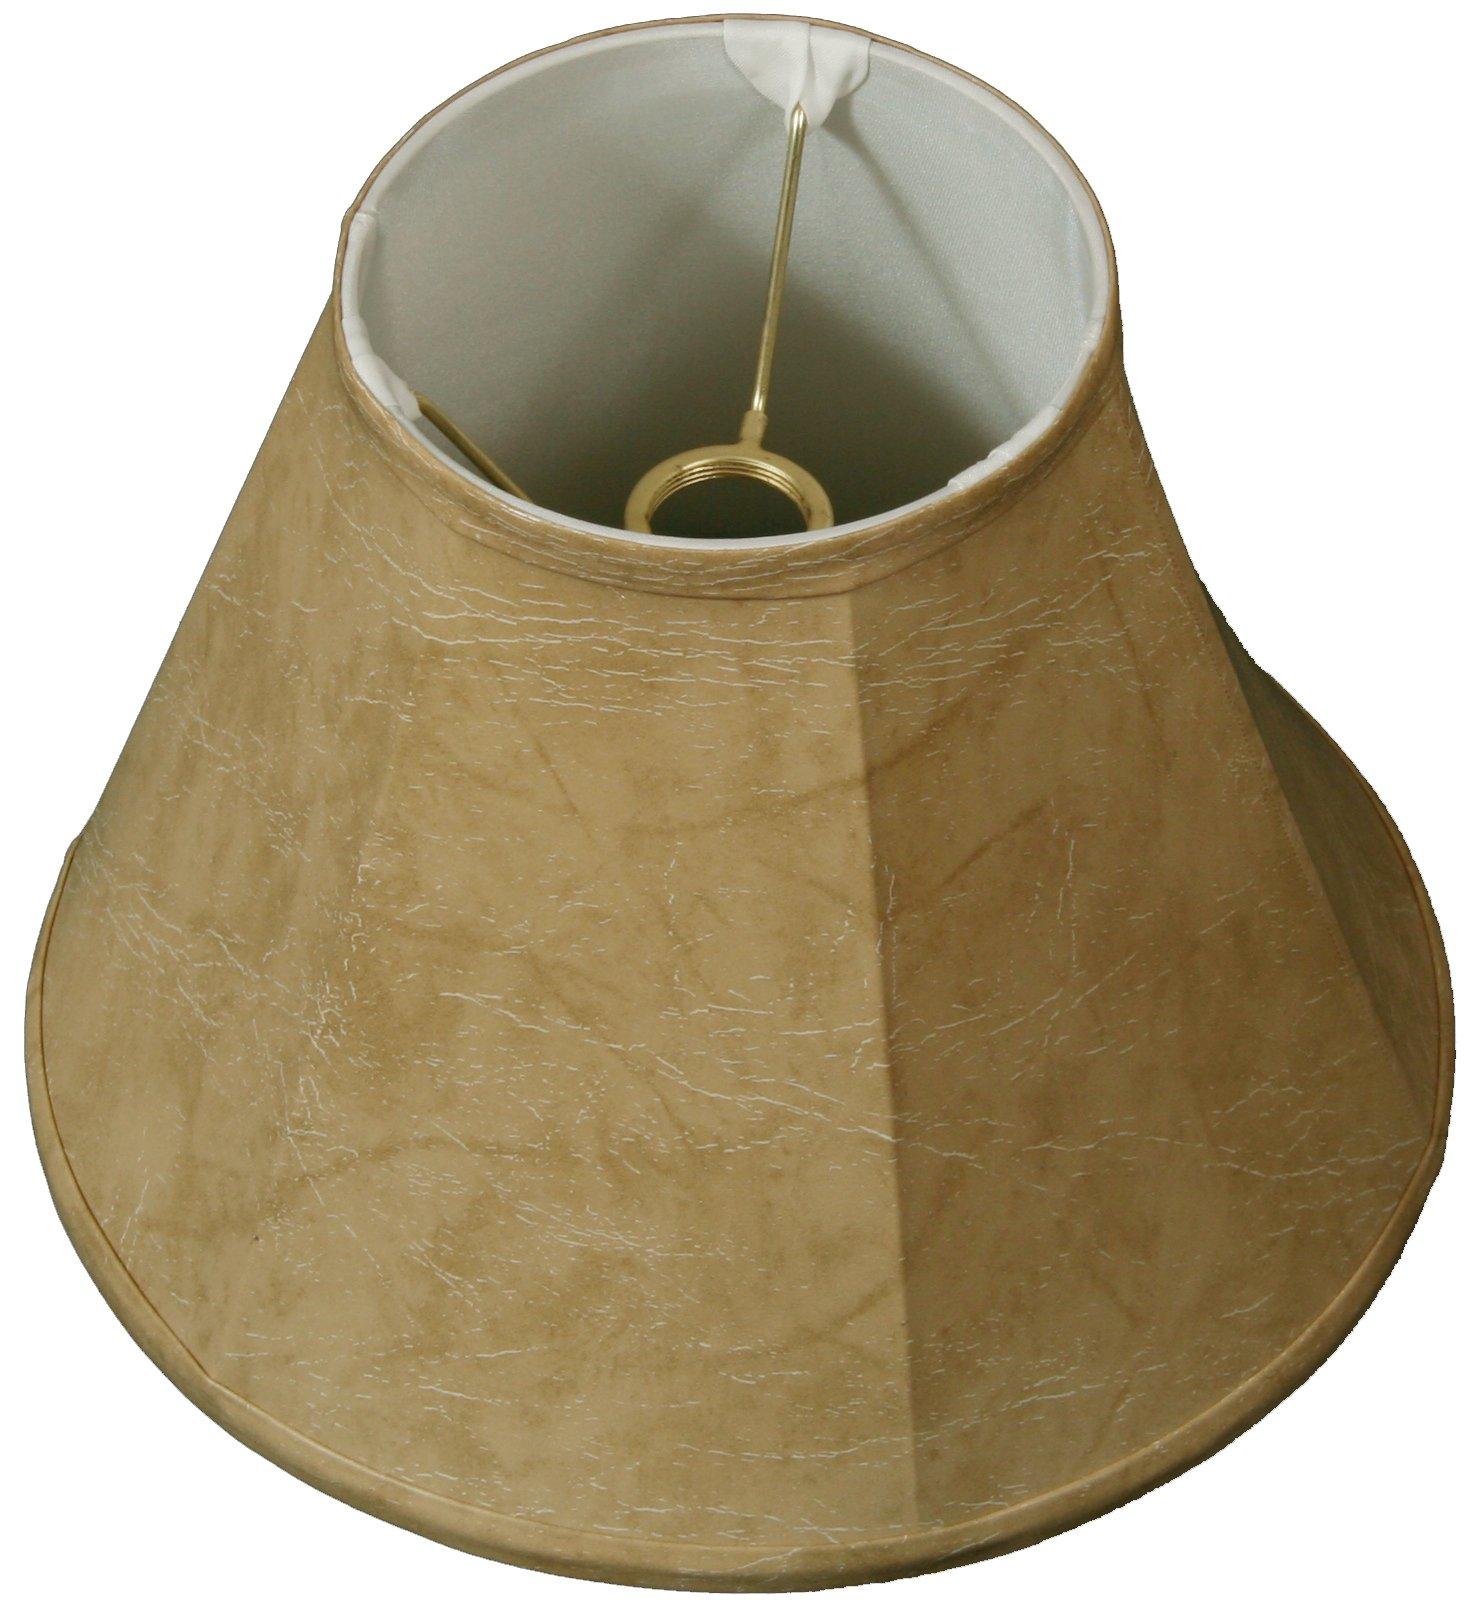 Royal Designs Deep Empire Lamp Shade, Mouton, 5 x 10 x 8, UNO Floor Lamp